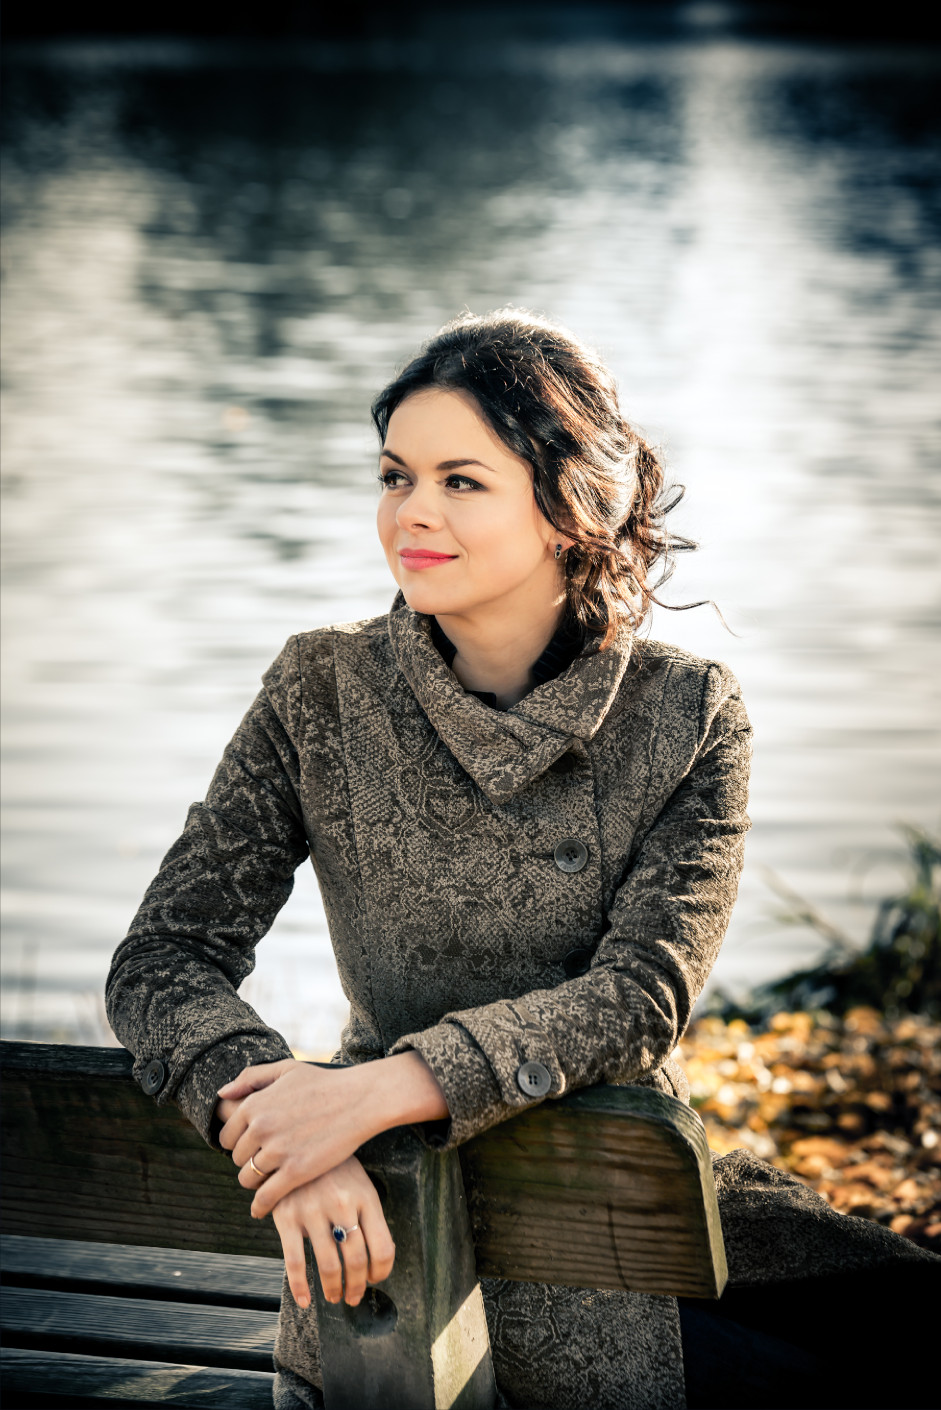 Nadezhda  Karyazina - Picture nr #21